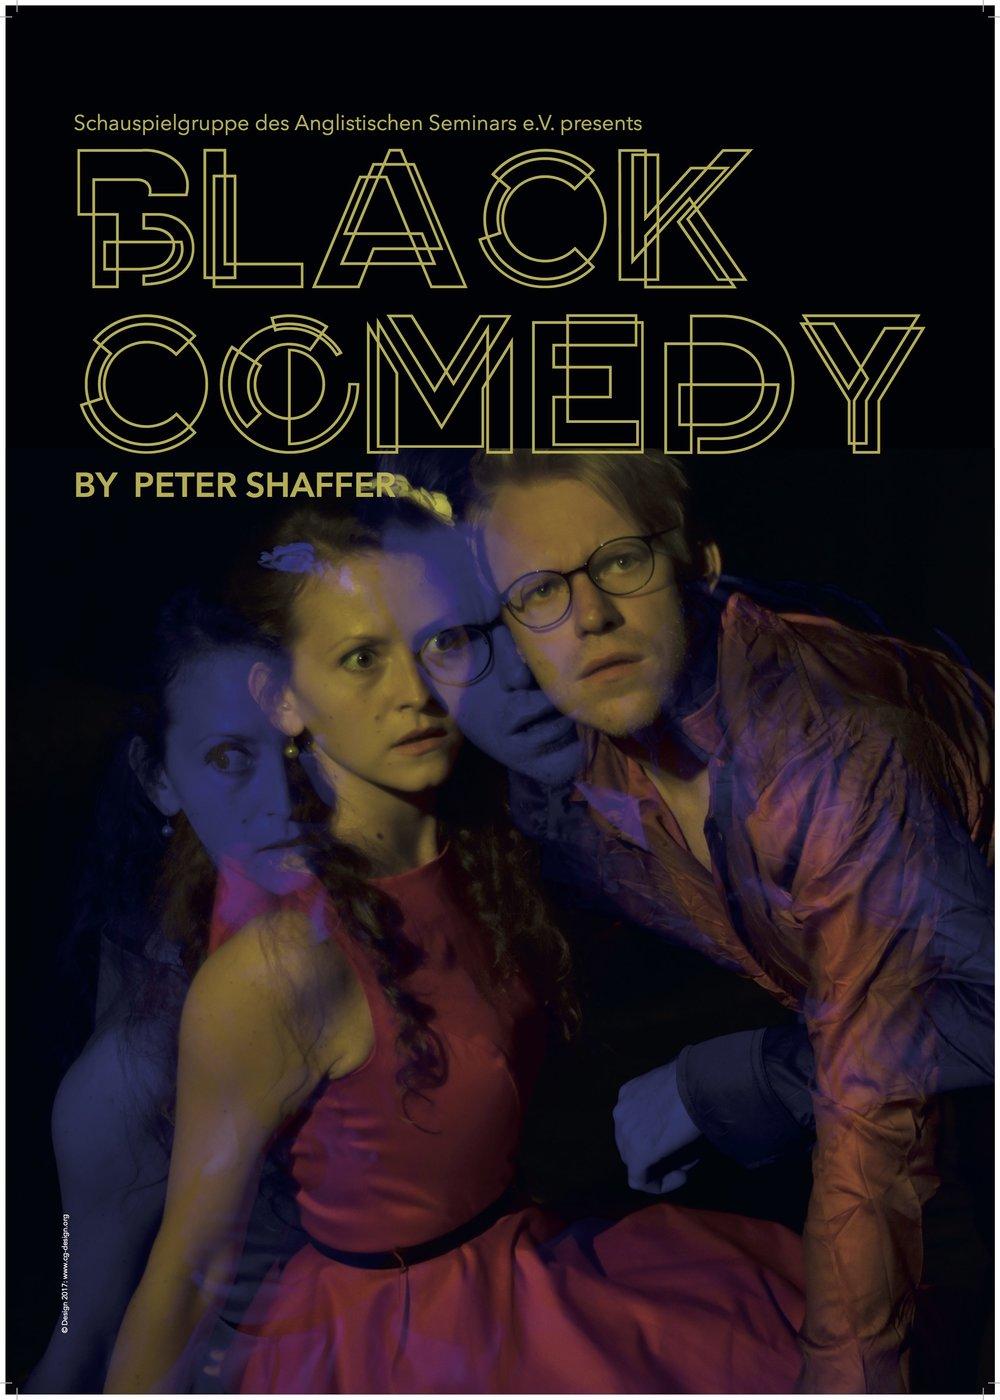 Black_Comedy_Anzeige.jpg